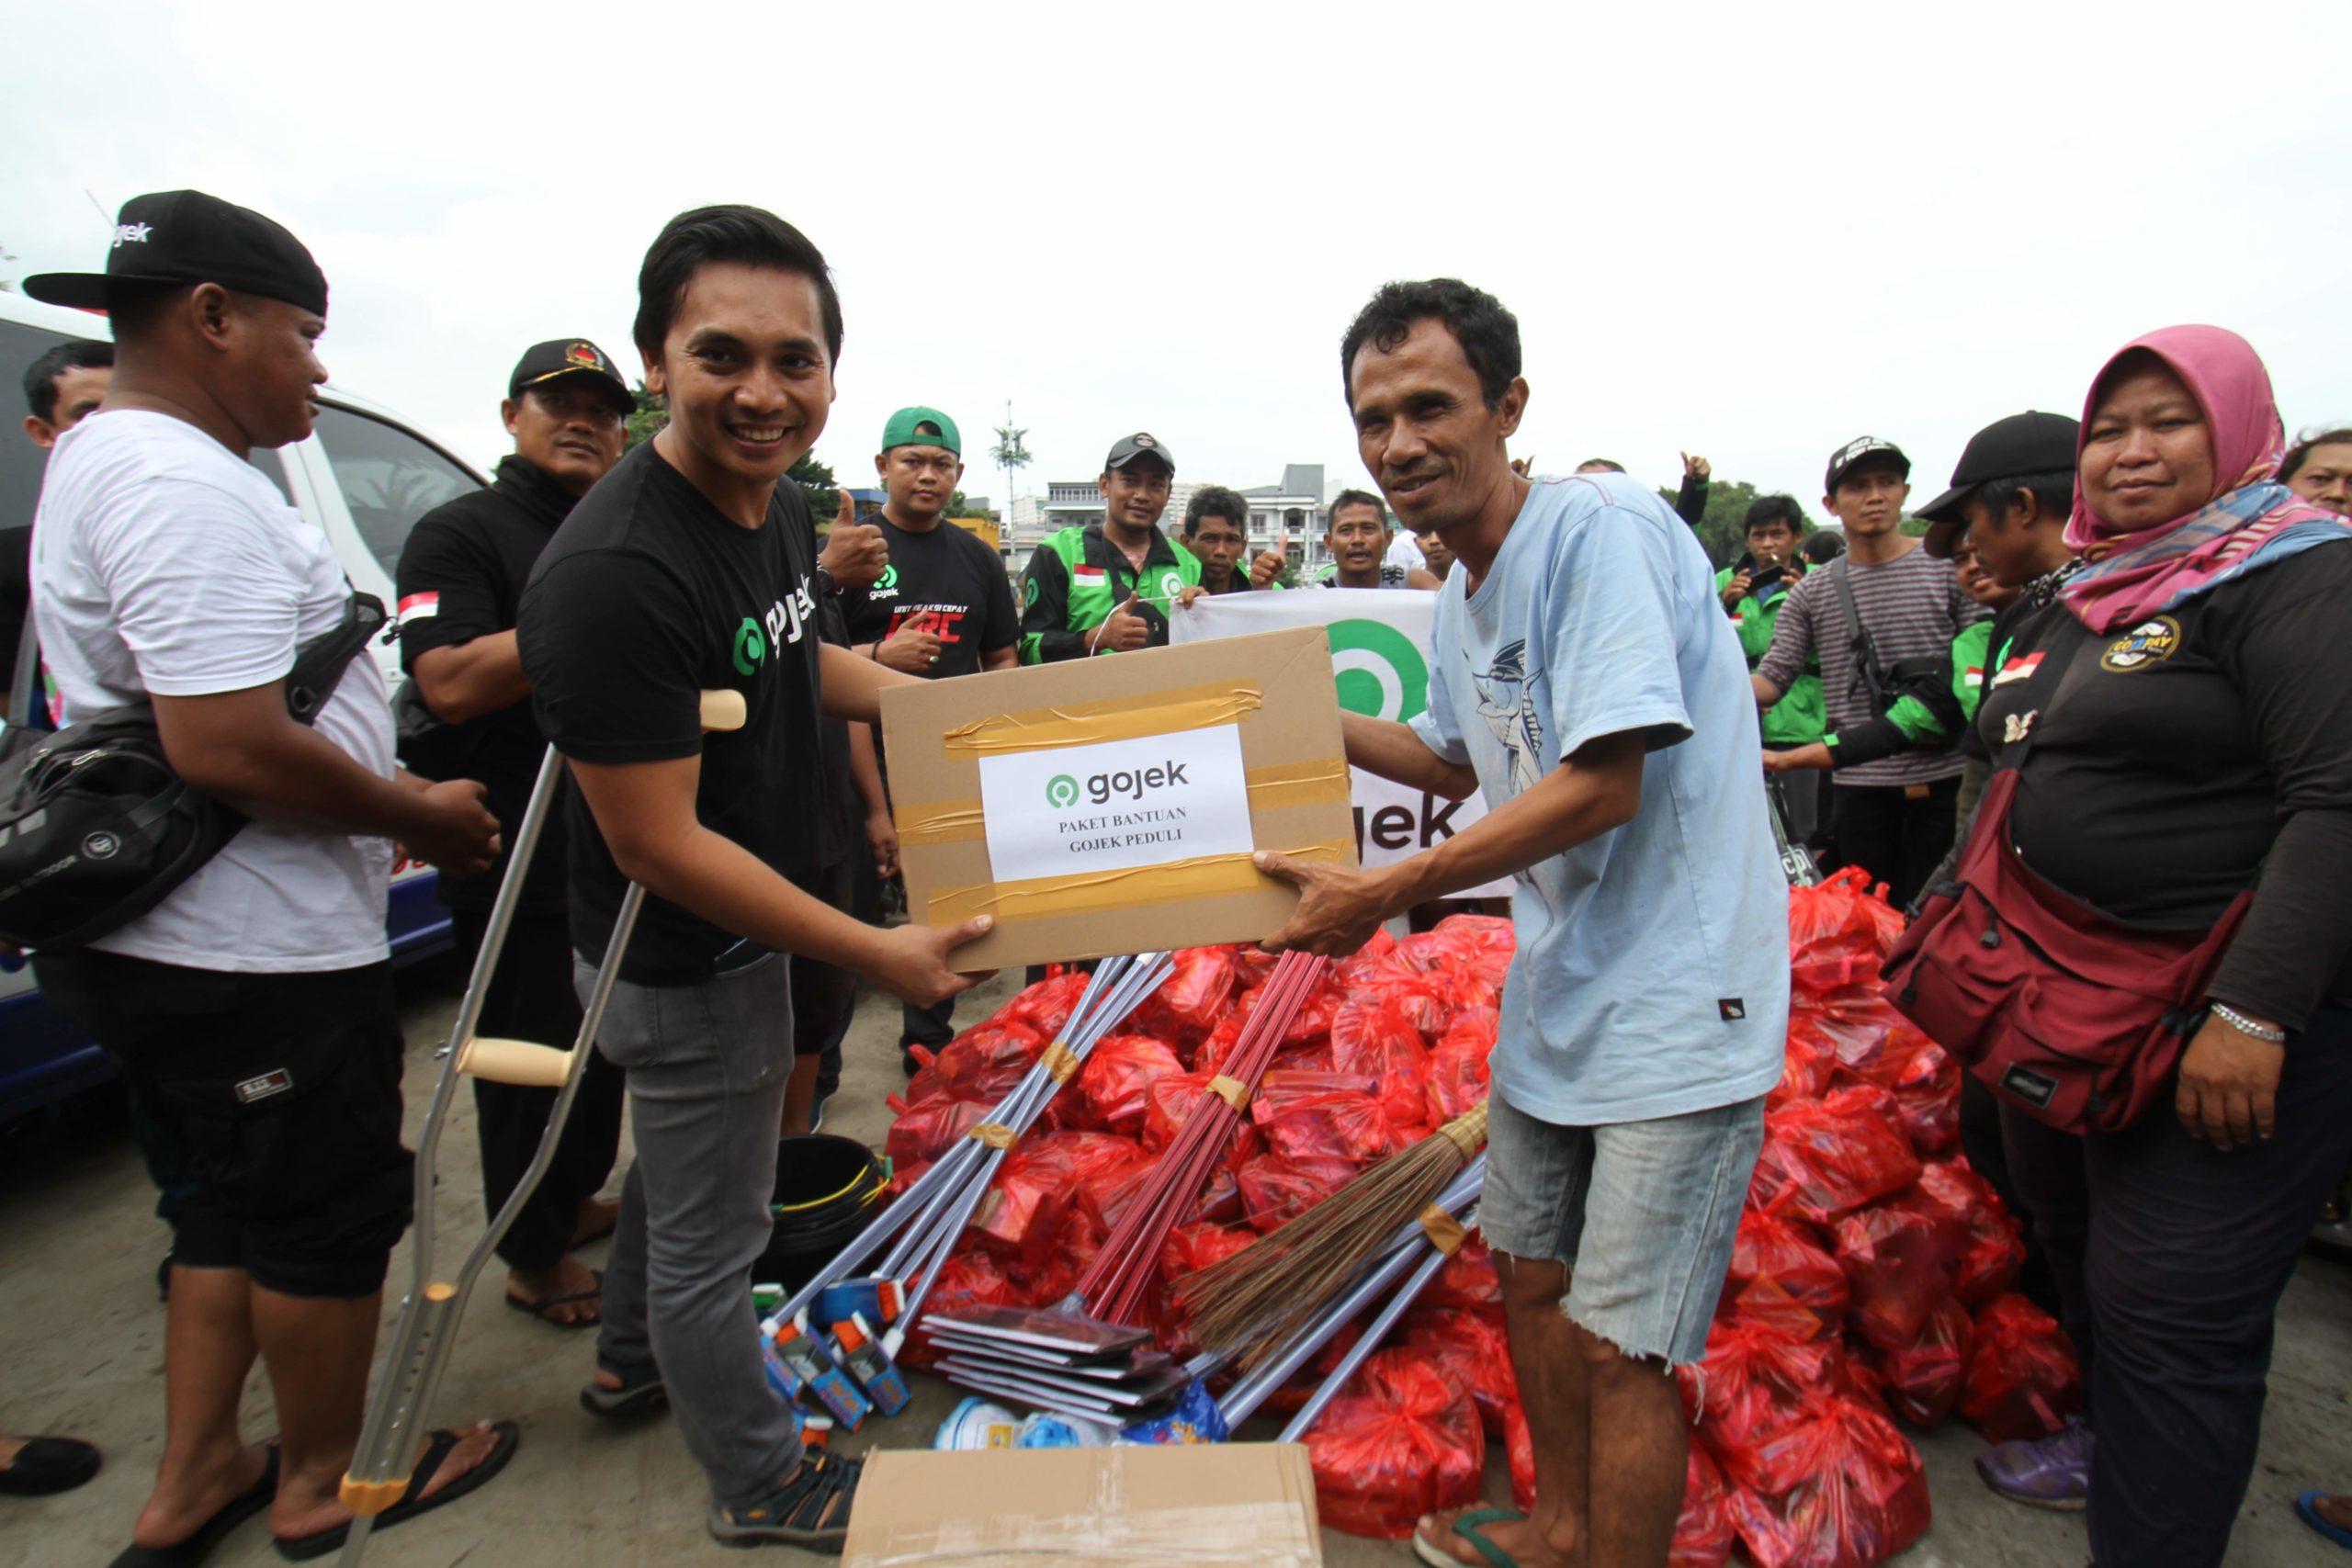 Ratusan Relawan Mitra dan Karyawan Gojek Salurkan Lebih dari 4.000 Paket Bantuan kepada Korban Banjir Jakarta